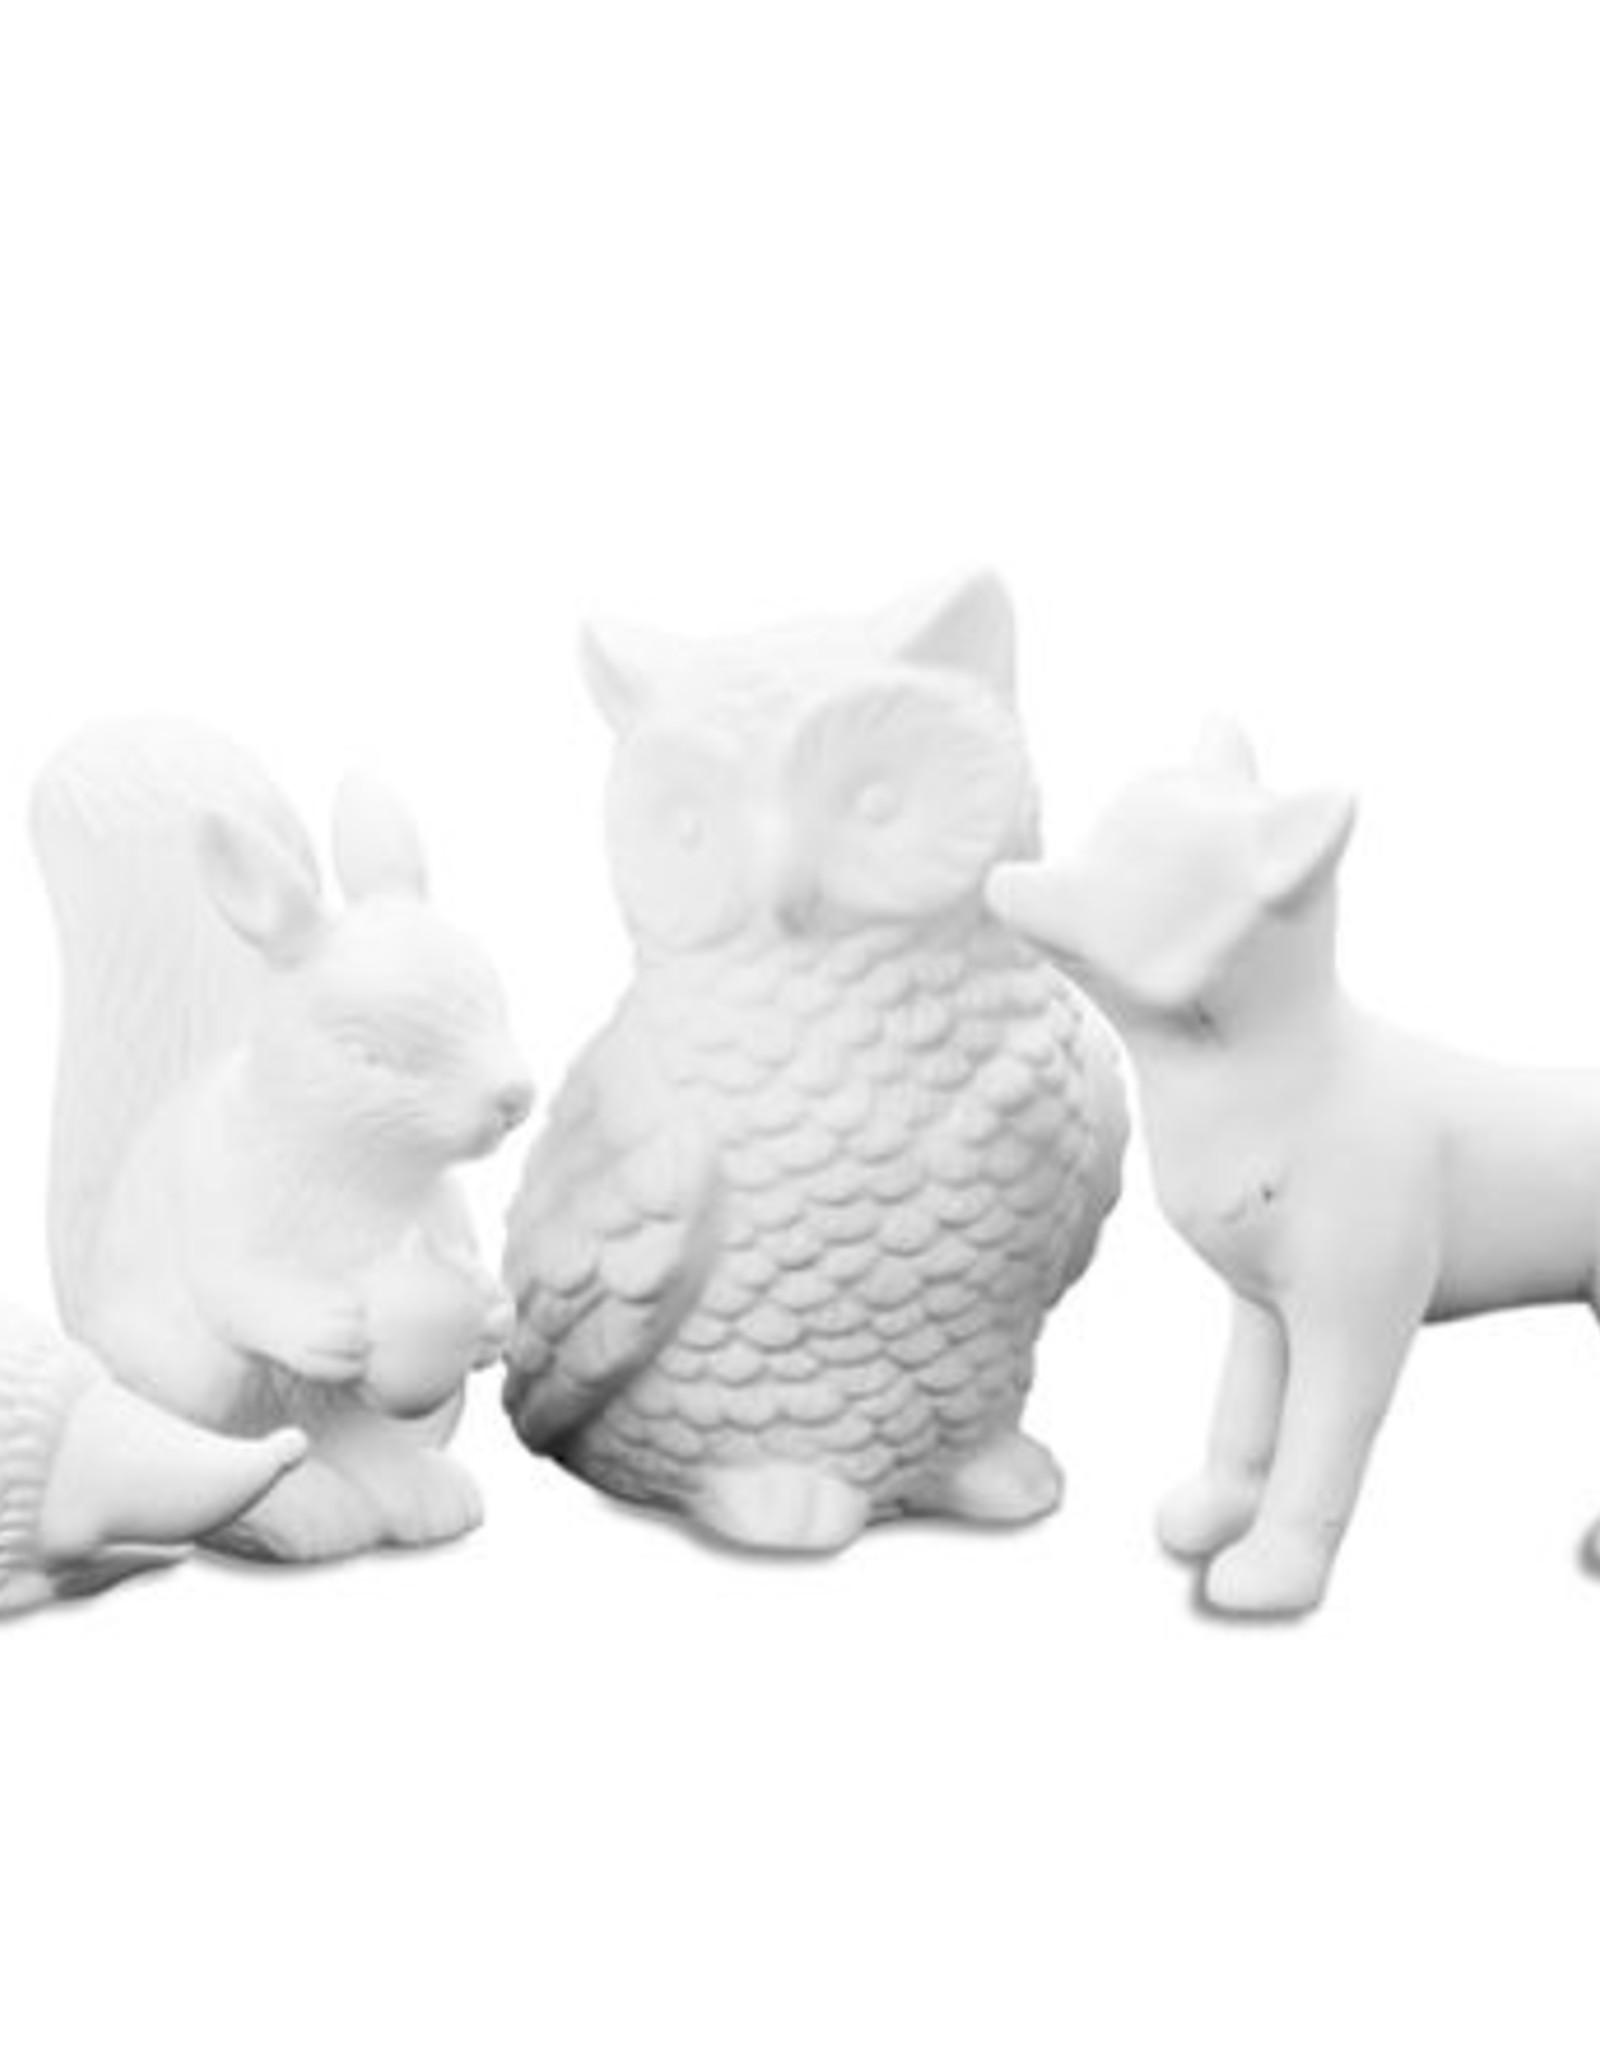 It's About Romi Fox, Owl, Hedgehog